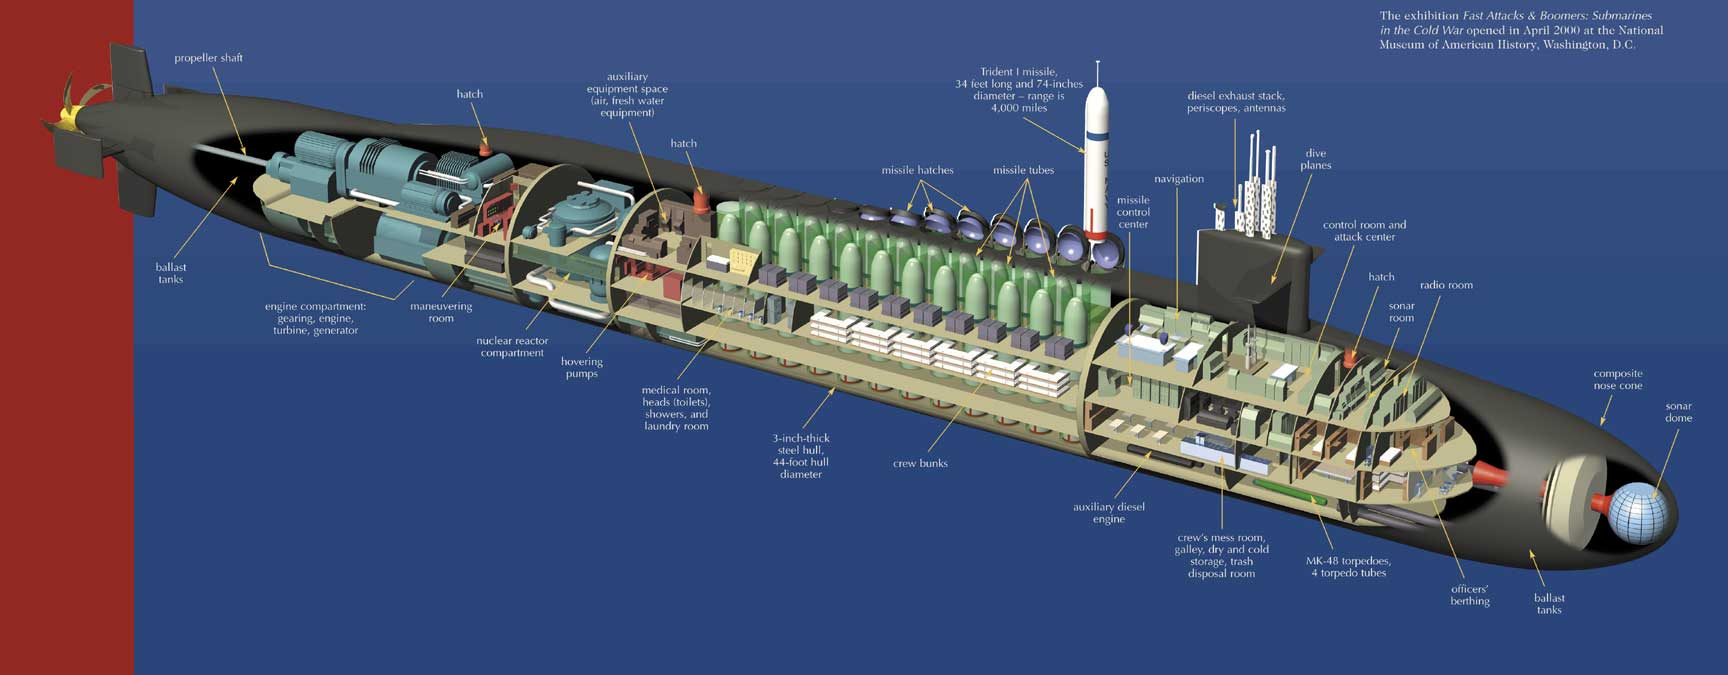 The Cold War Equipment Cost Weapons And Warfare Modern Tank Schematics Cutaway